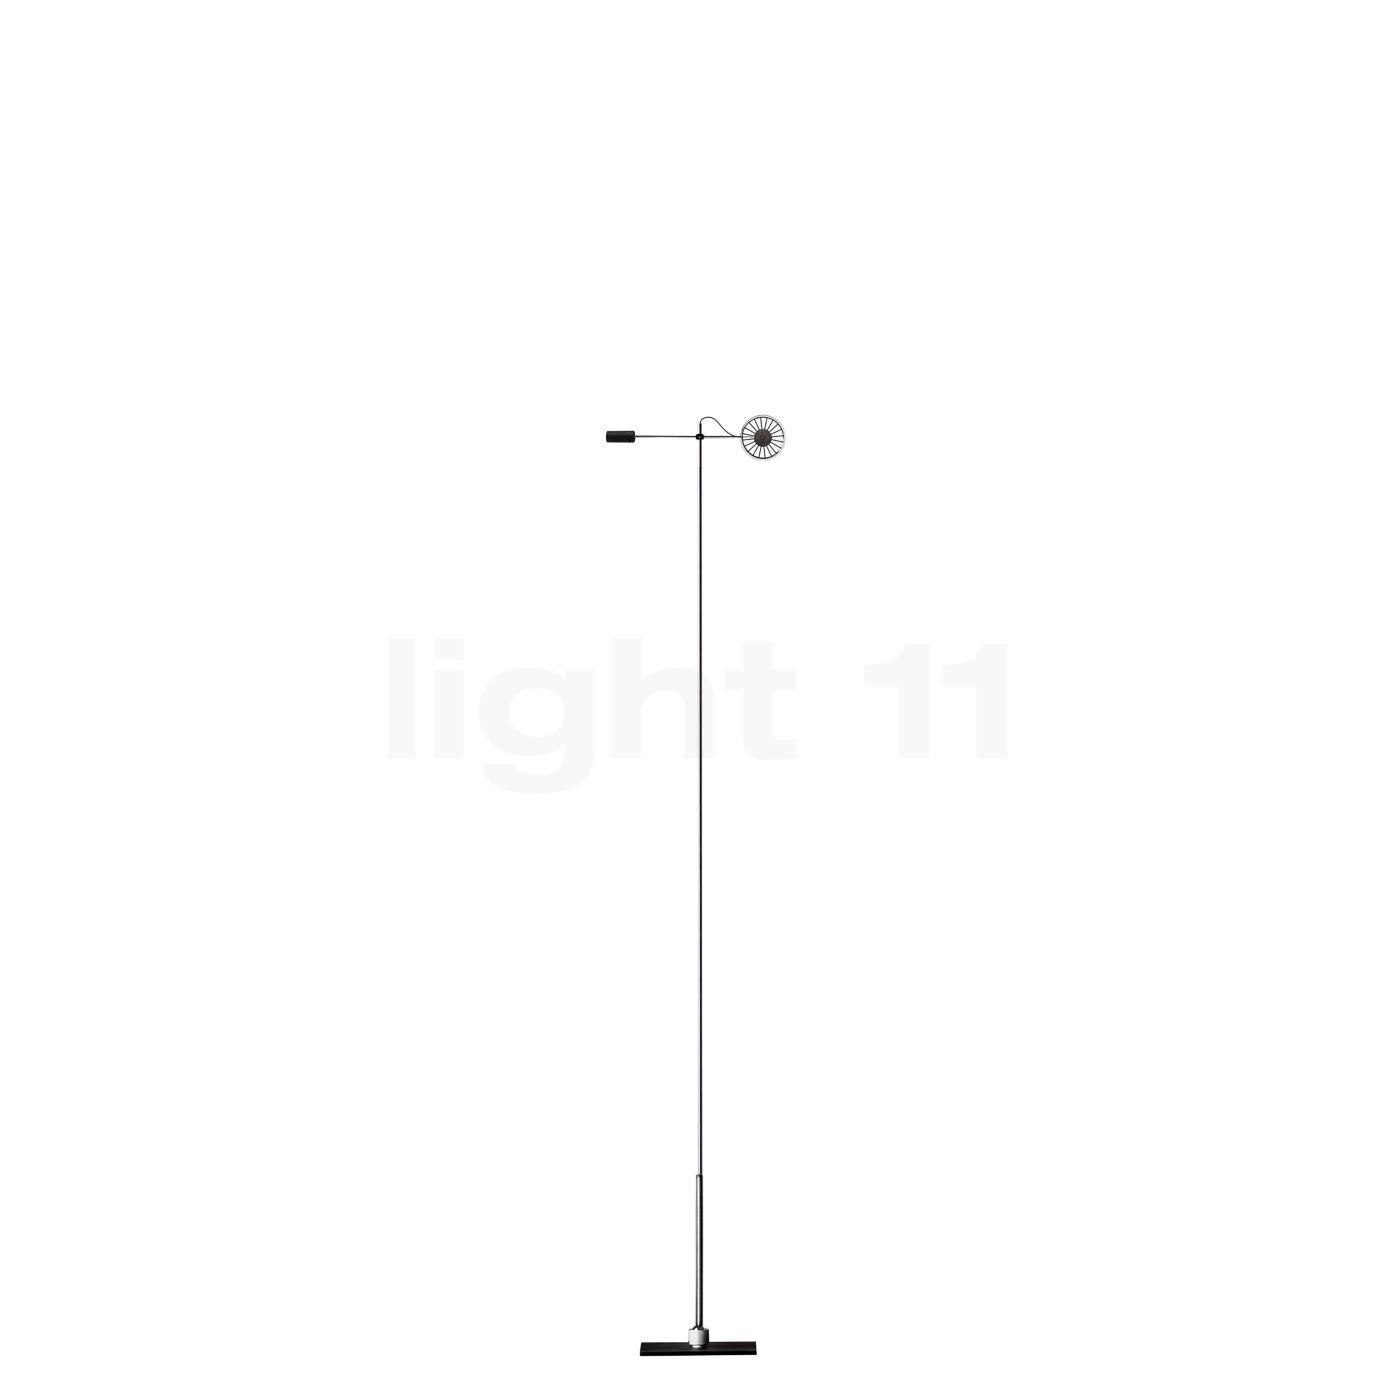 Absolut Lighting Absolut vloerlamp kopen bij light11.nl